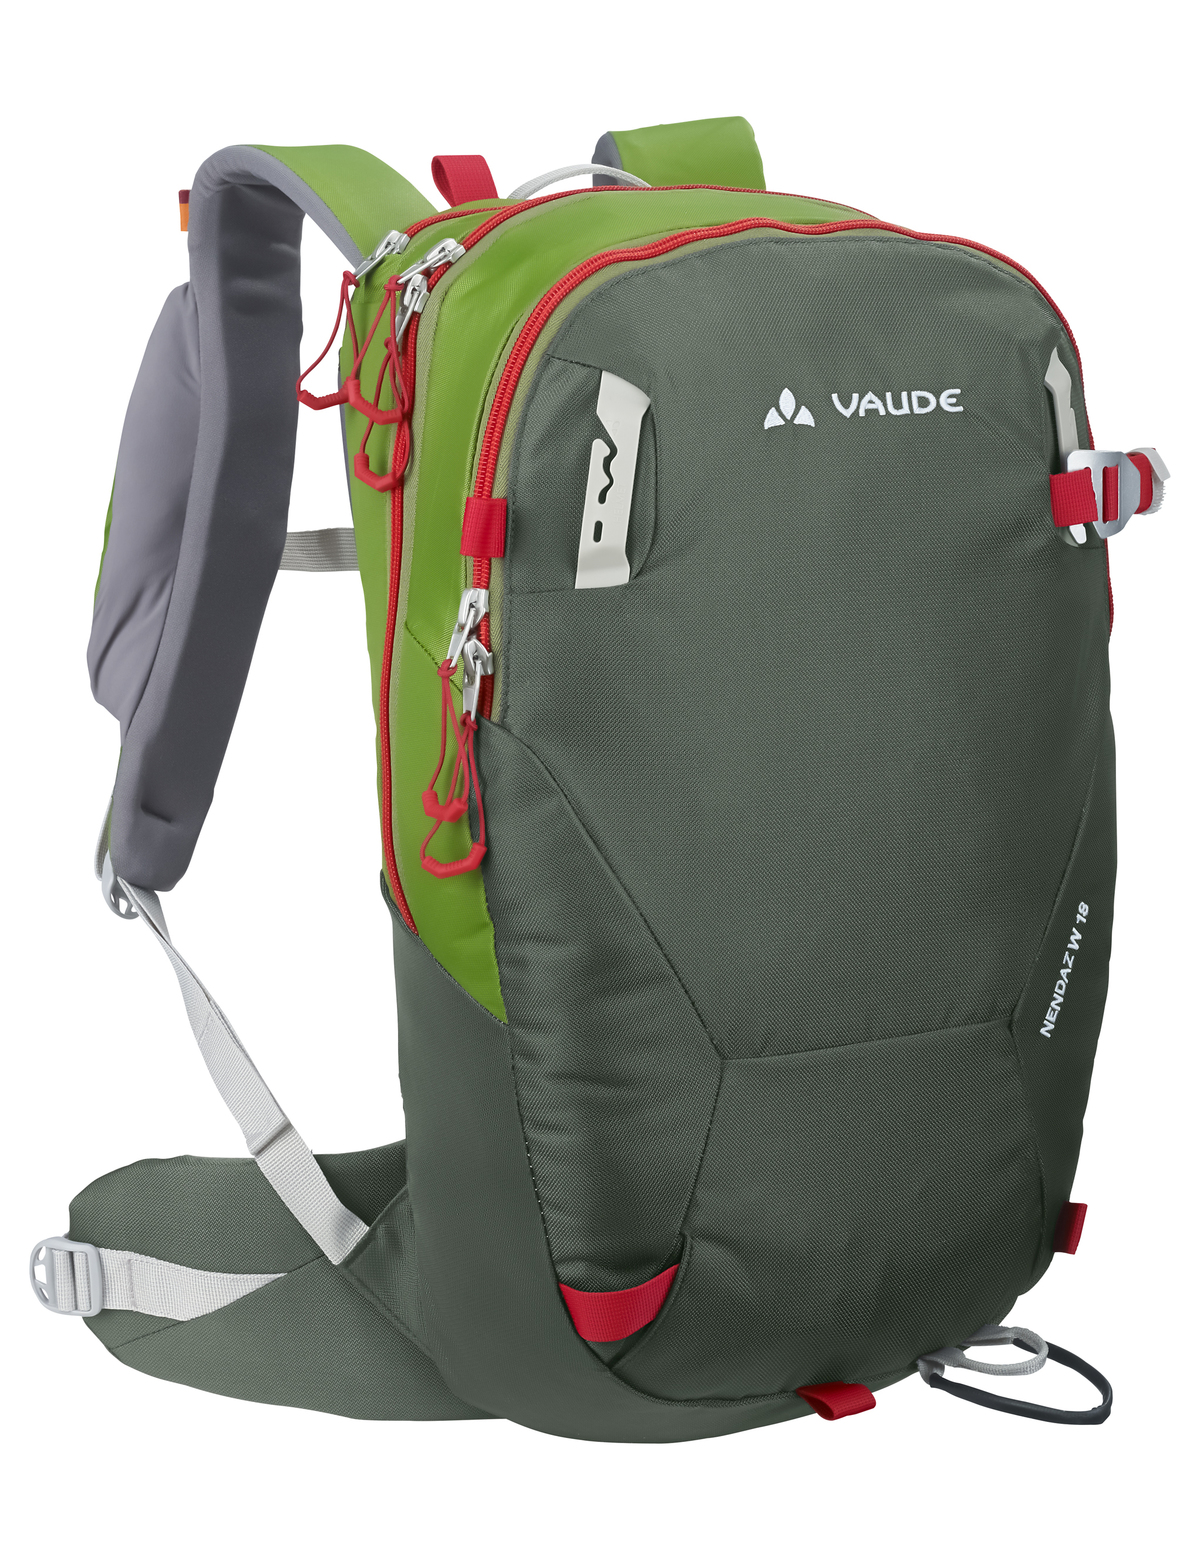 Skialpinistické a freeride batohy